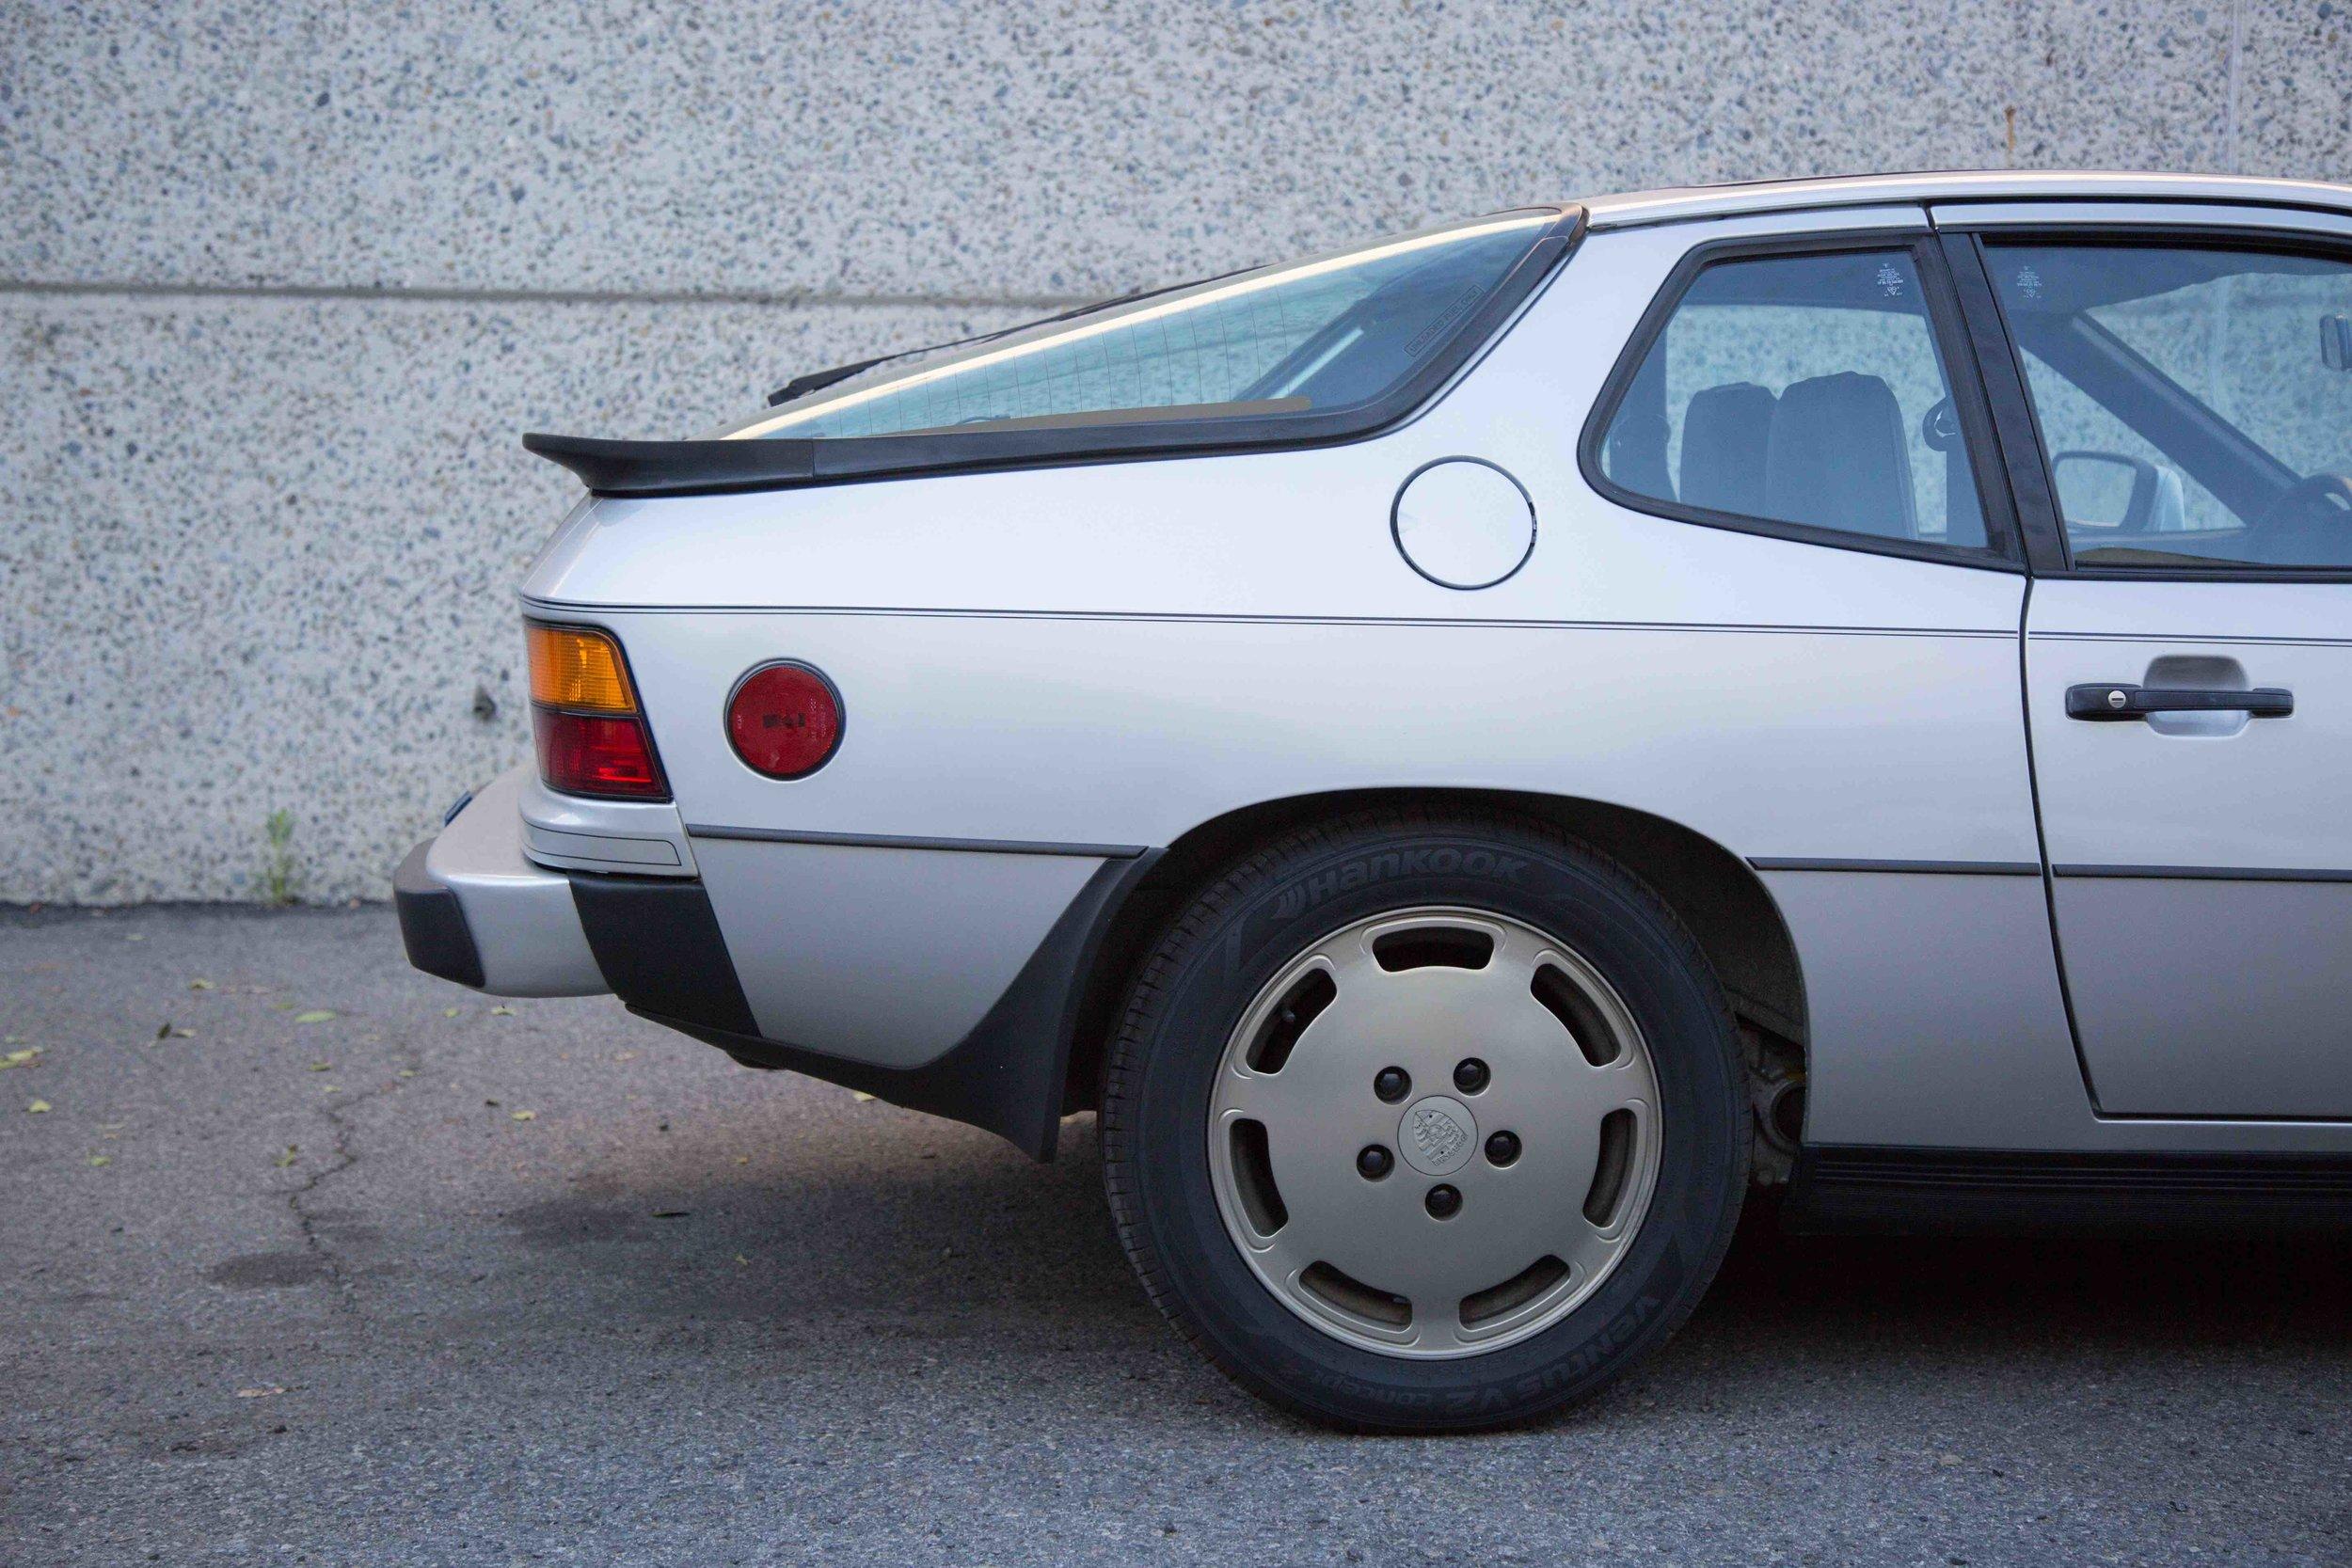 1980-924-Turbo-passenger-exterior-view-makellos-classics.jpeg